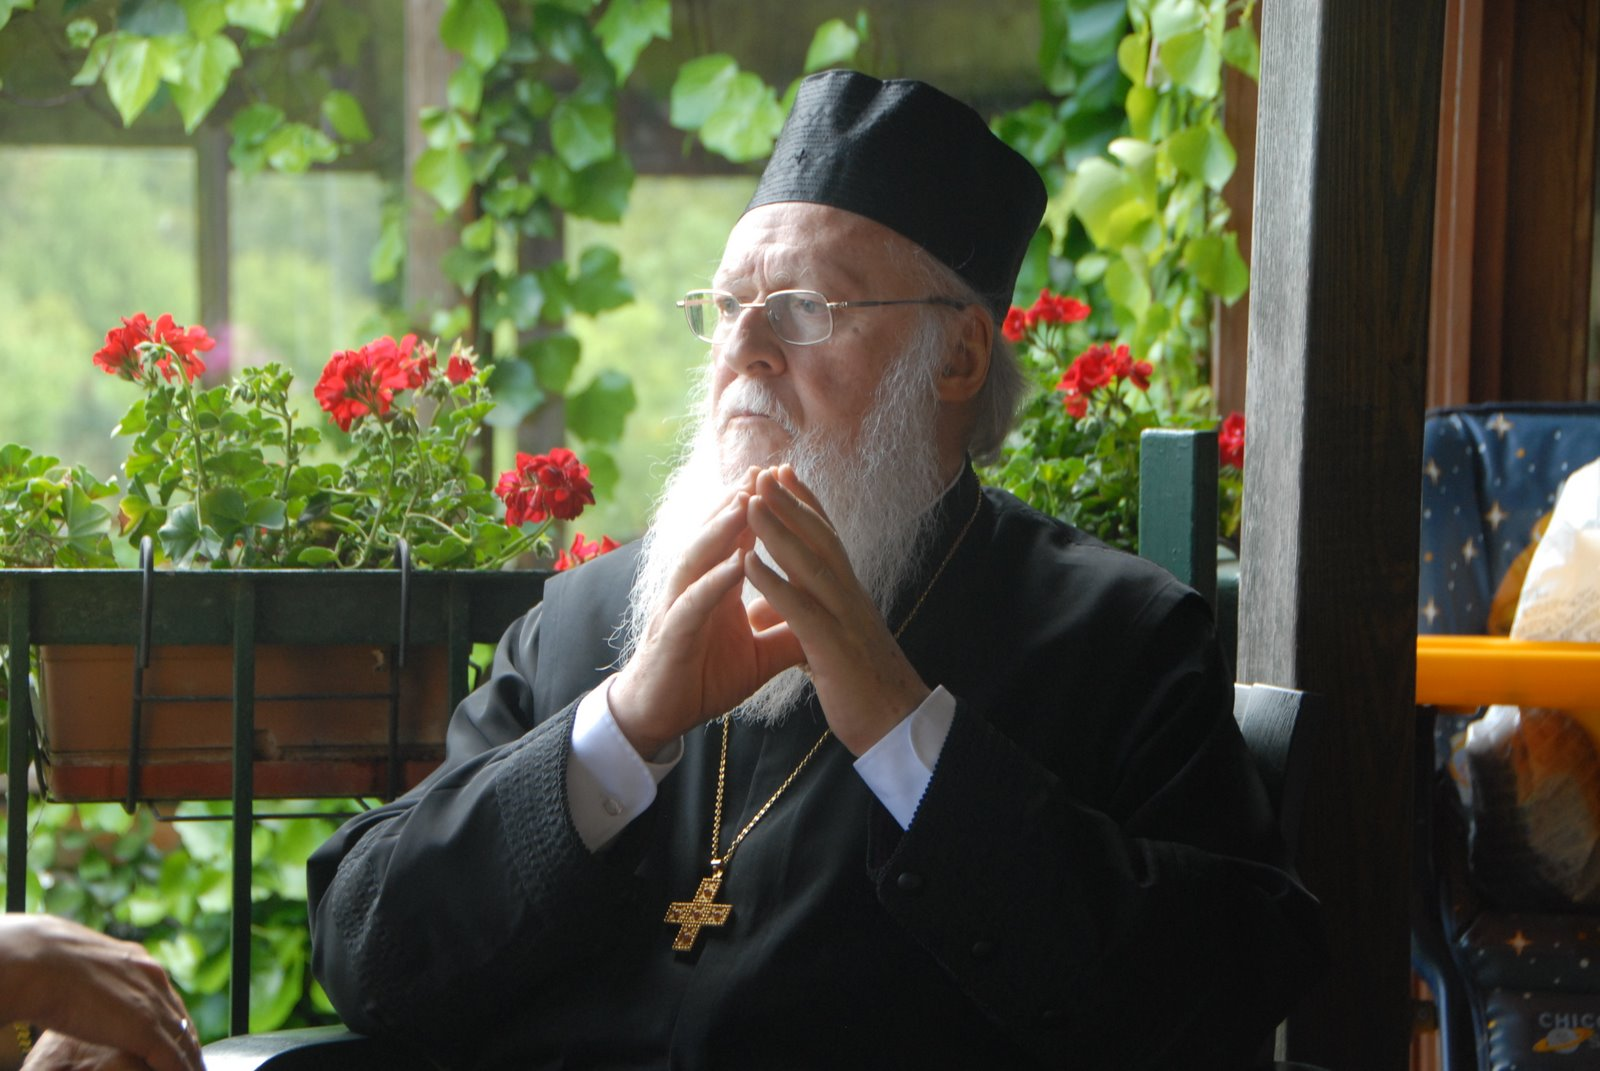 Speech by Patriarch Bartholomew, Ecumenical Patriarch at the KAICIID